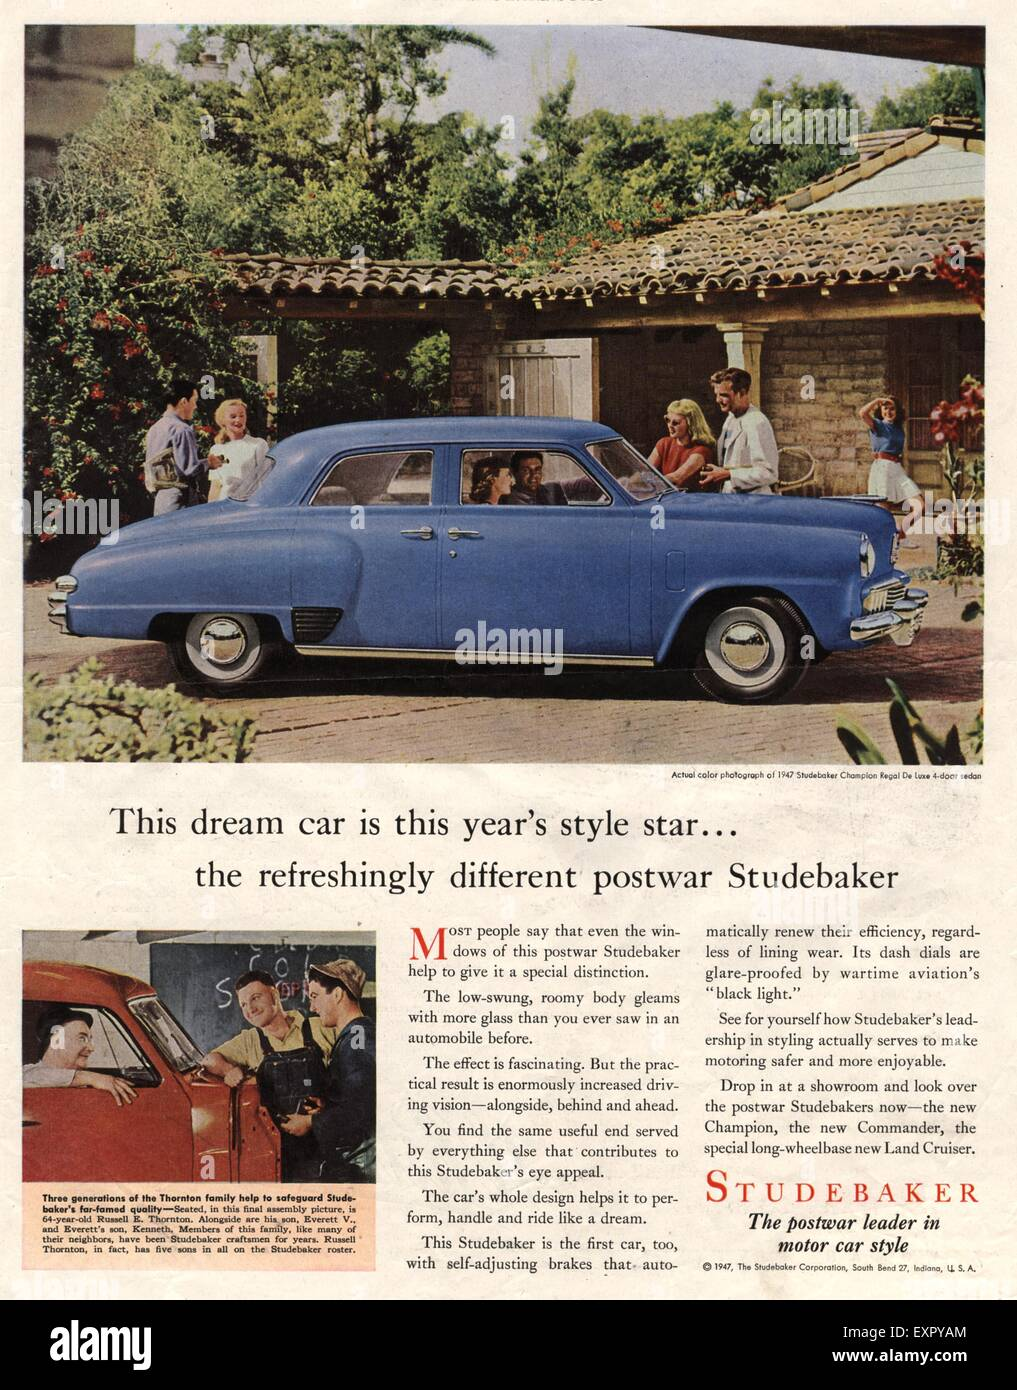 1940s USA Studebaker Cars Magazine Advert Stock Photo: 85326940 - Alamy